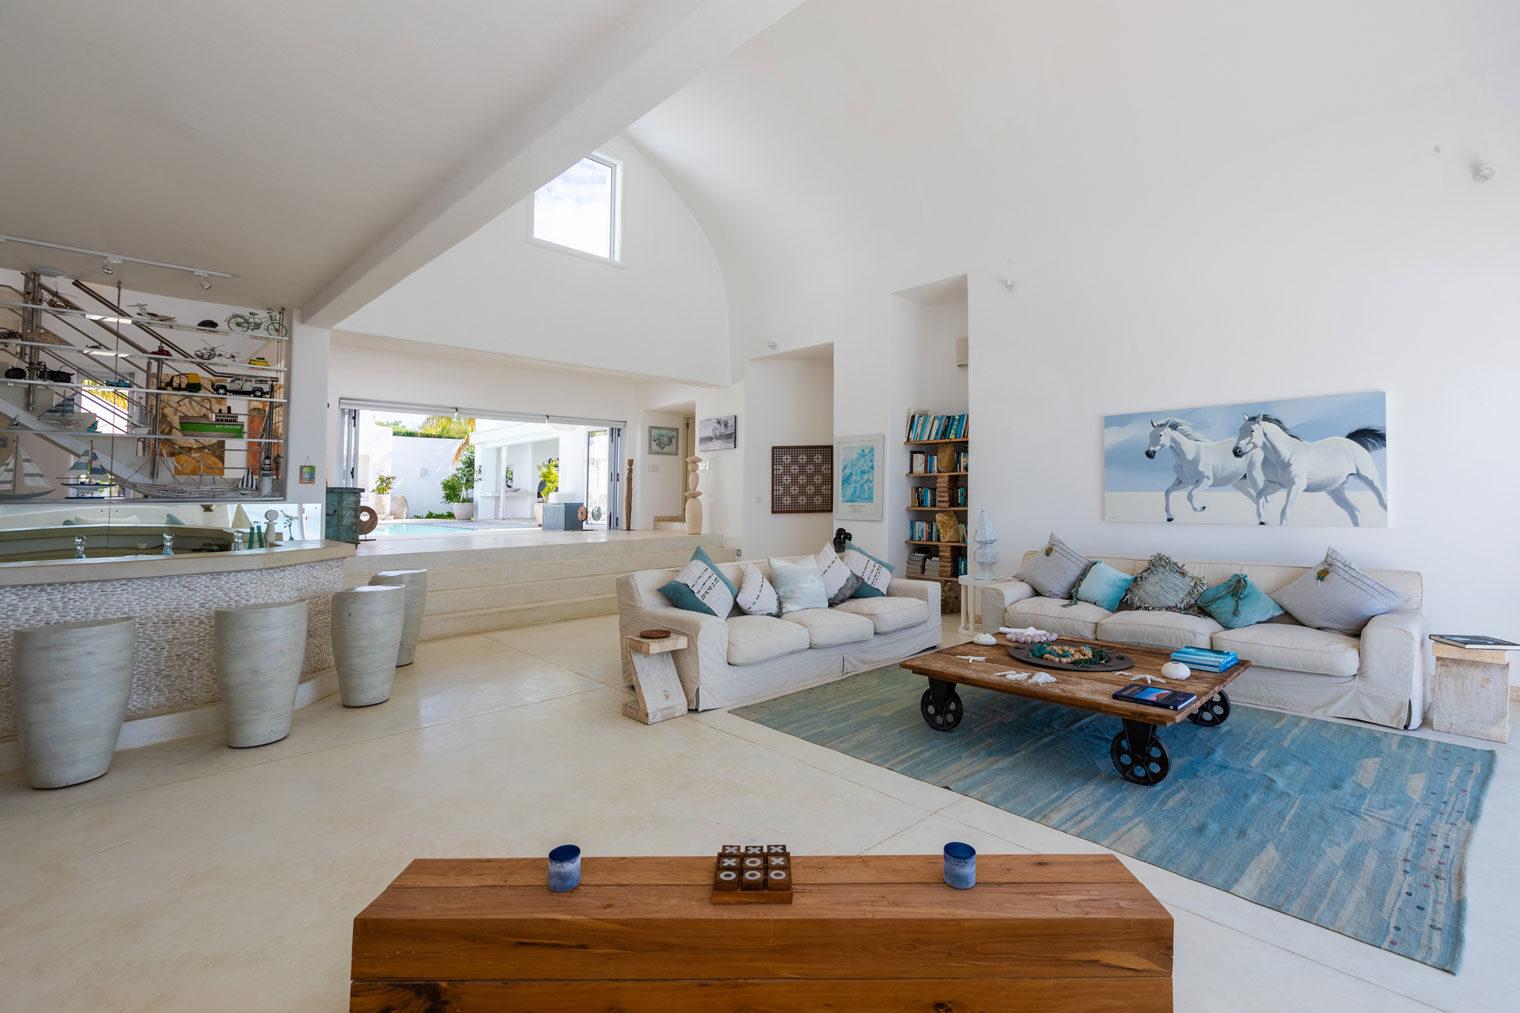 Santorini-Mozambique-Lounge-Area